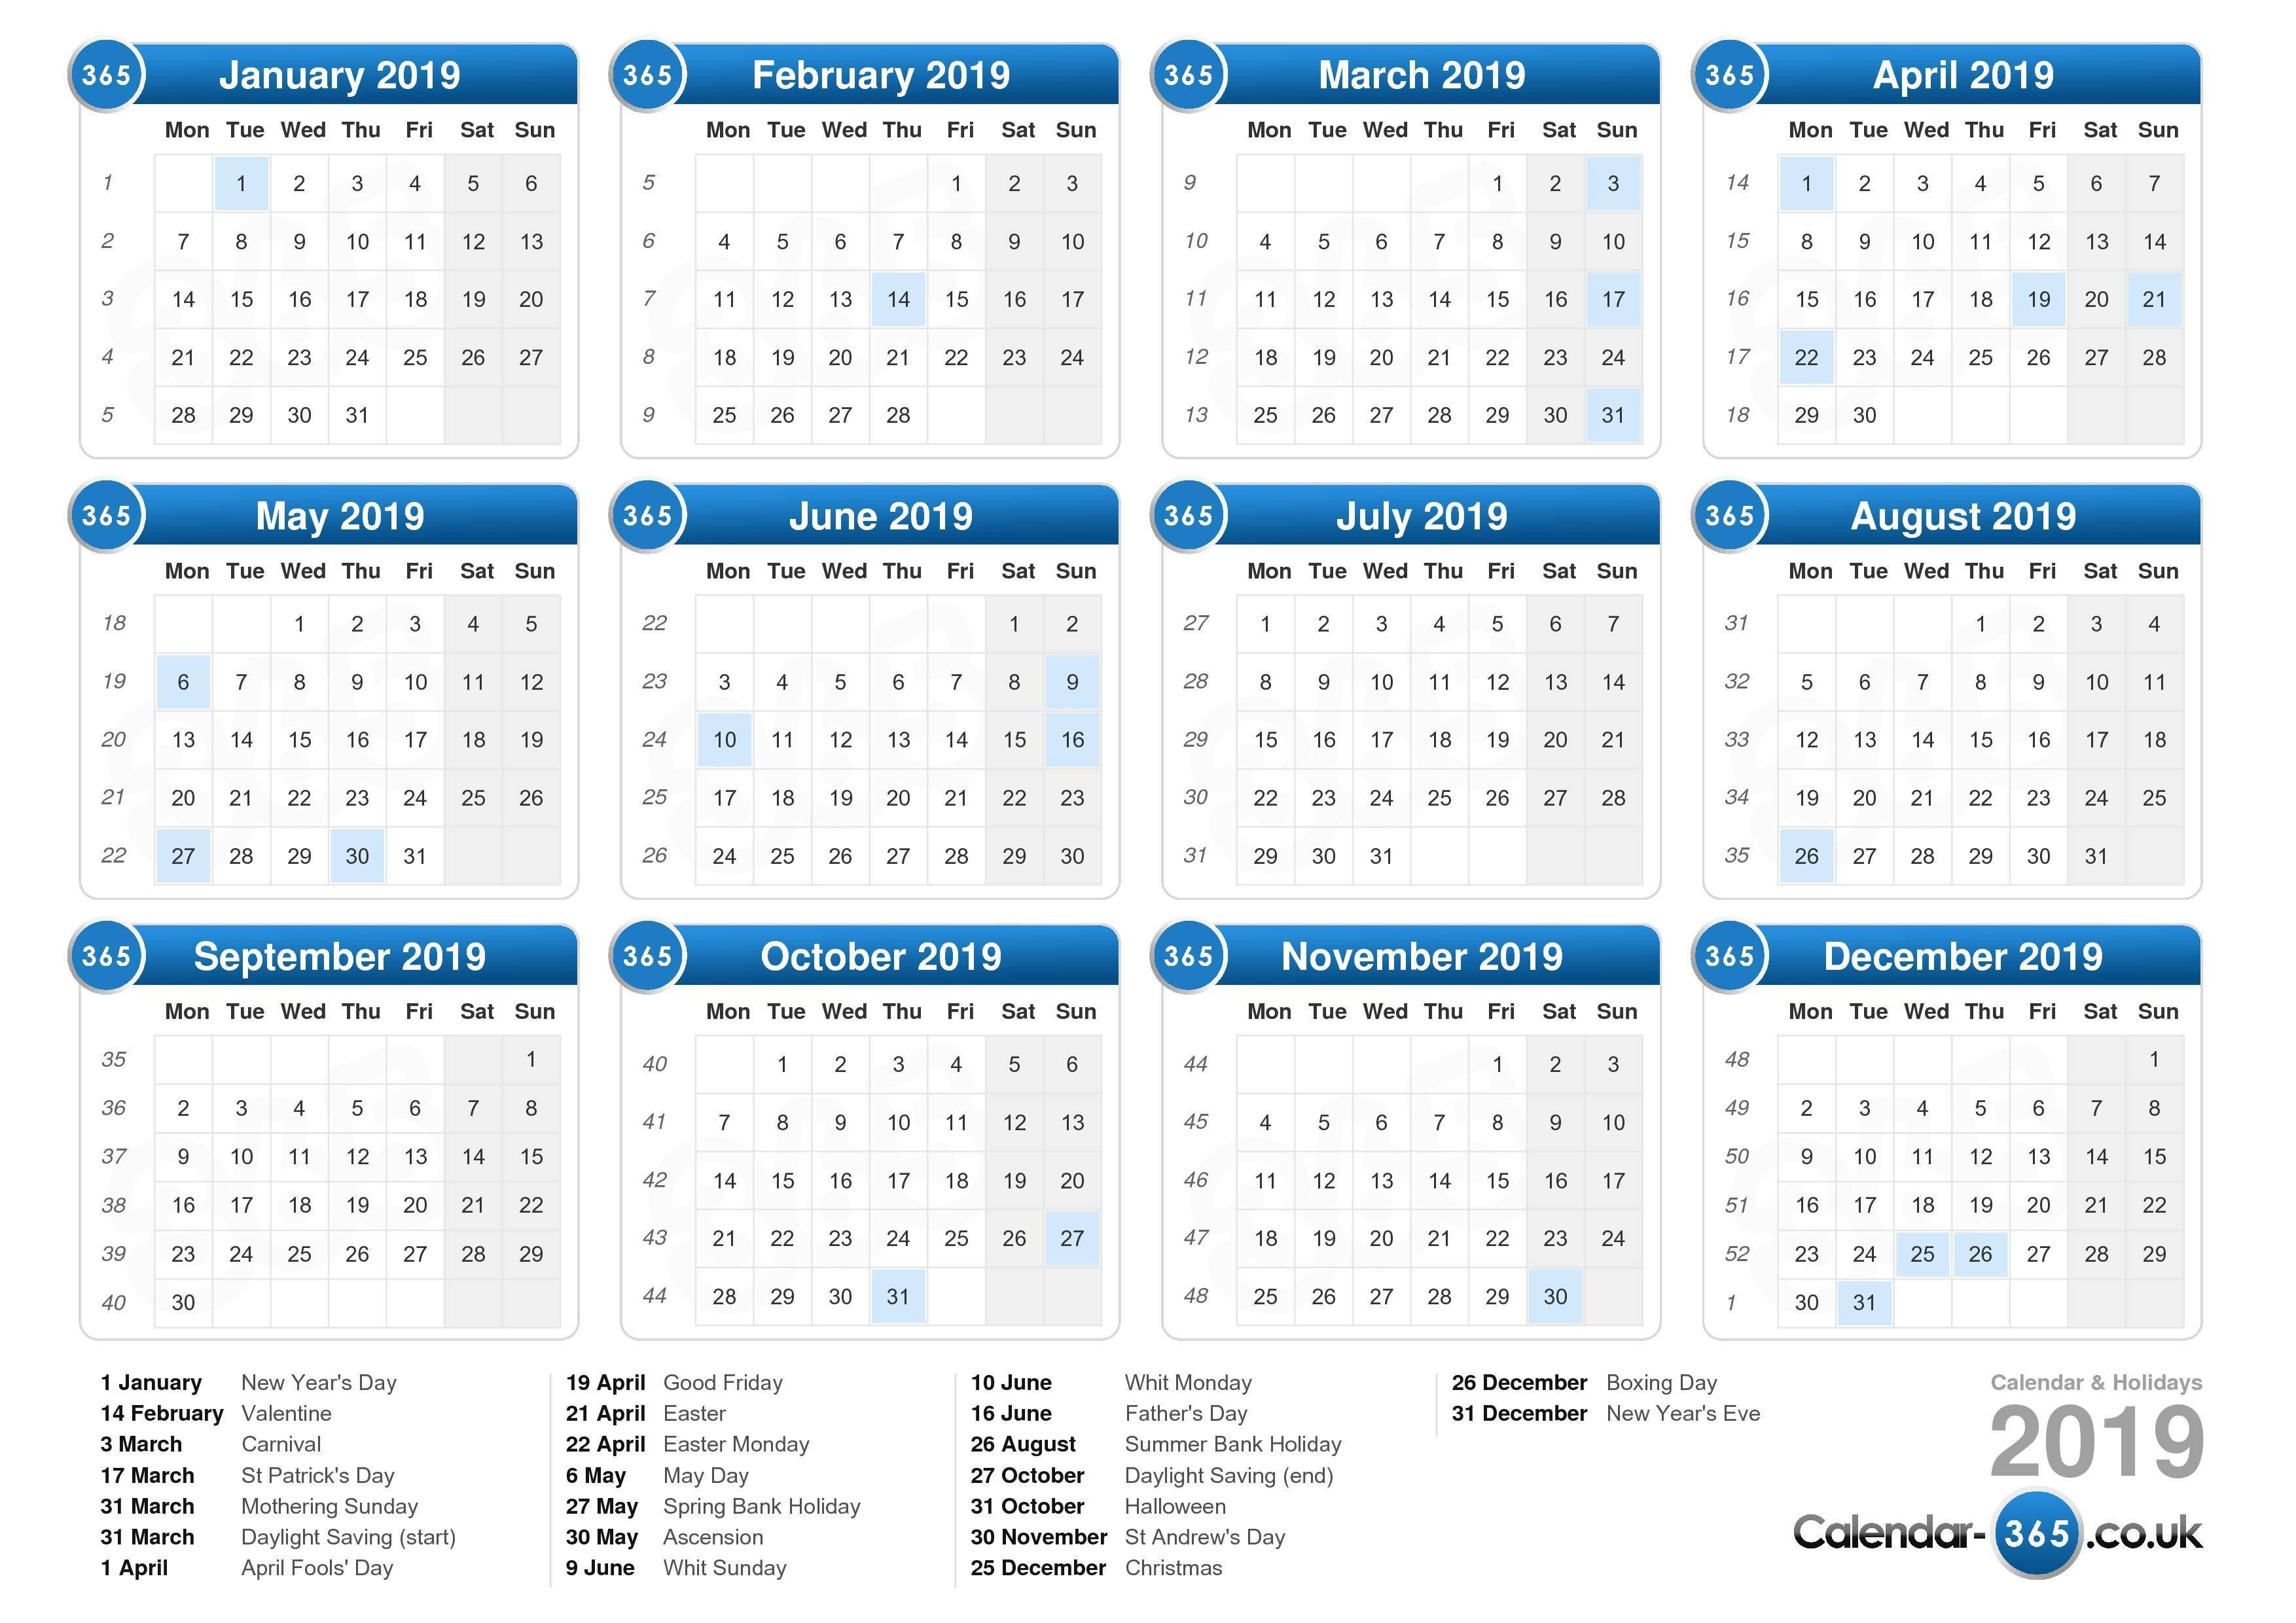 Calendar 2019 2019 Calendar 365